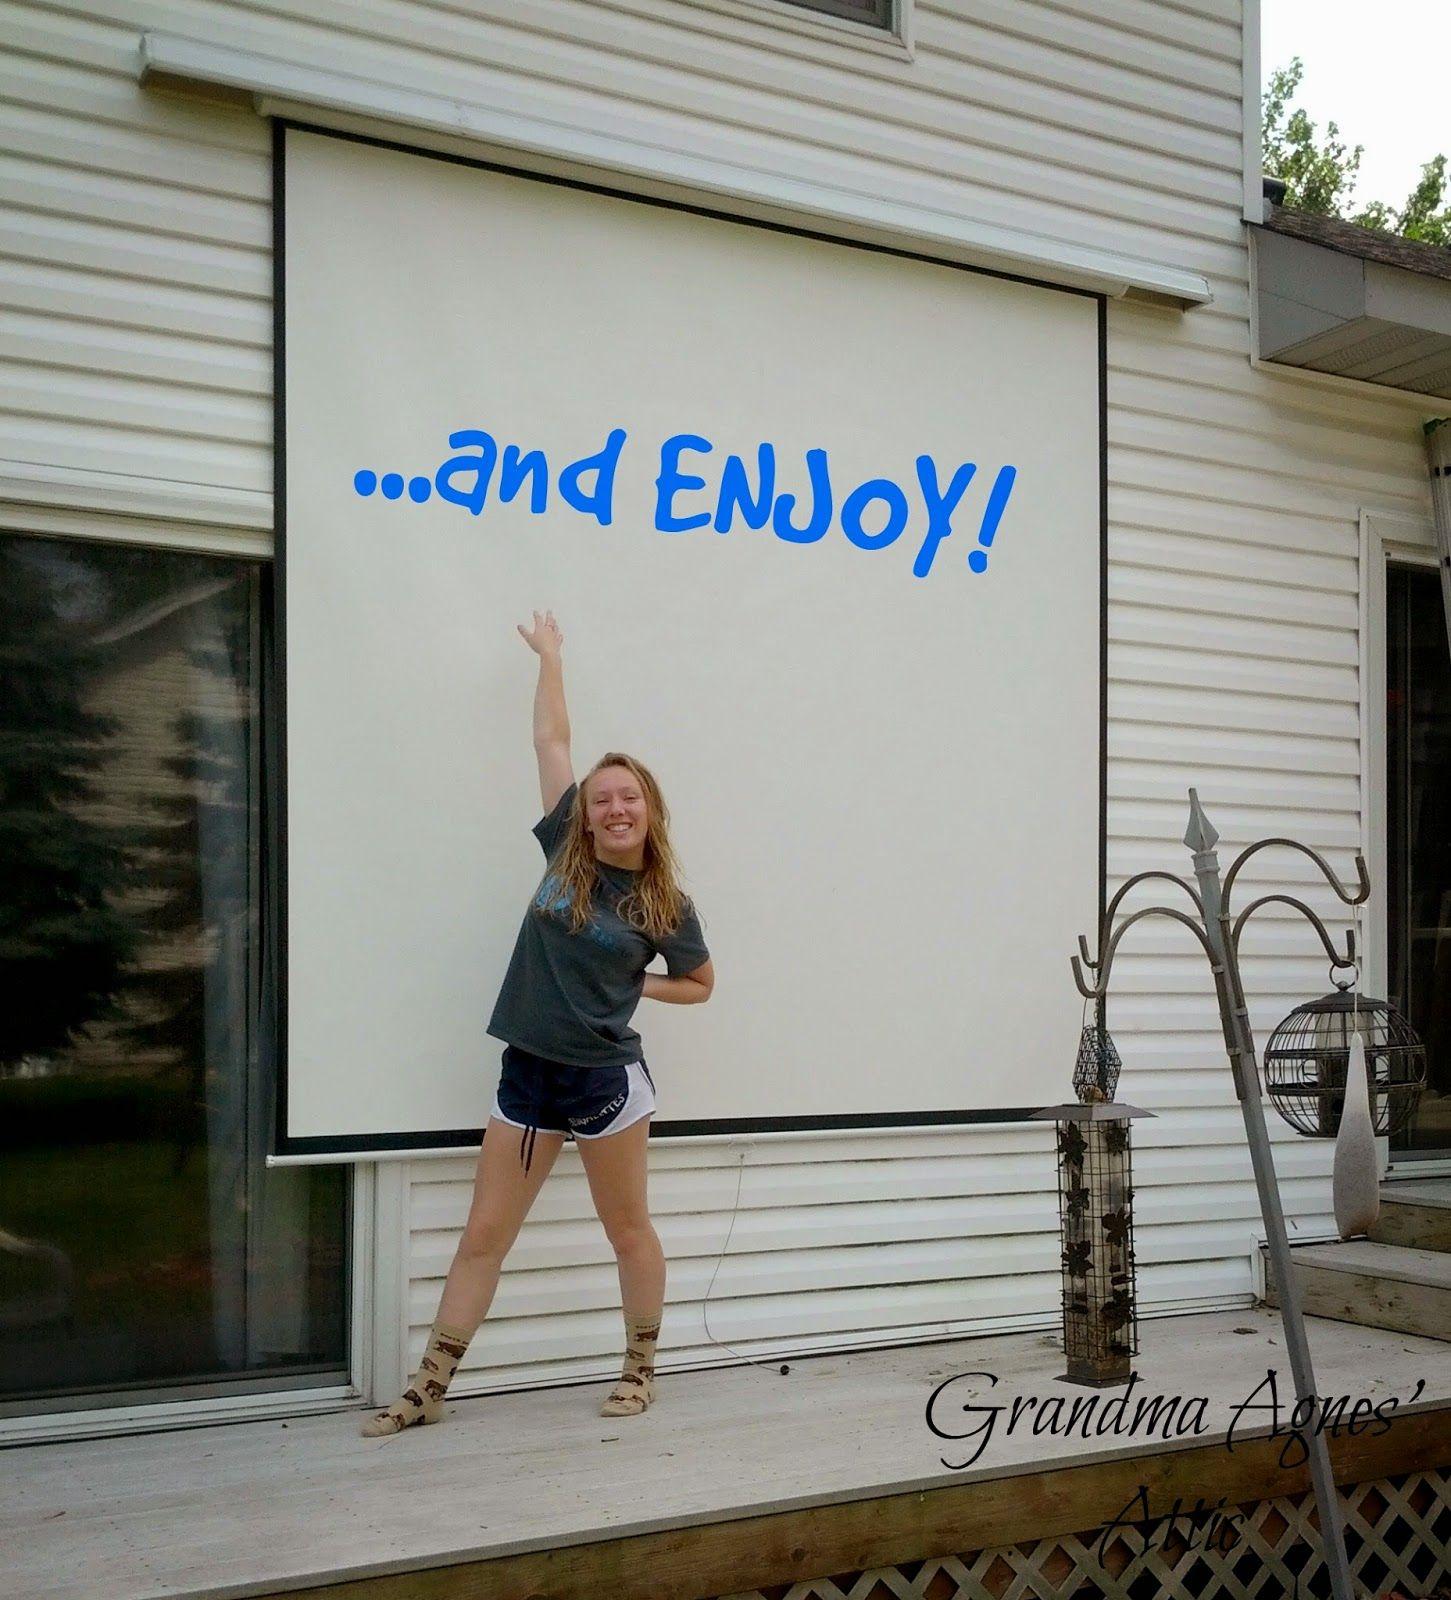 Grandma Agnes\' Attic: Outdoor Movie Screen {in your Own Backyard ...